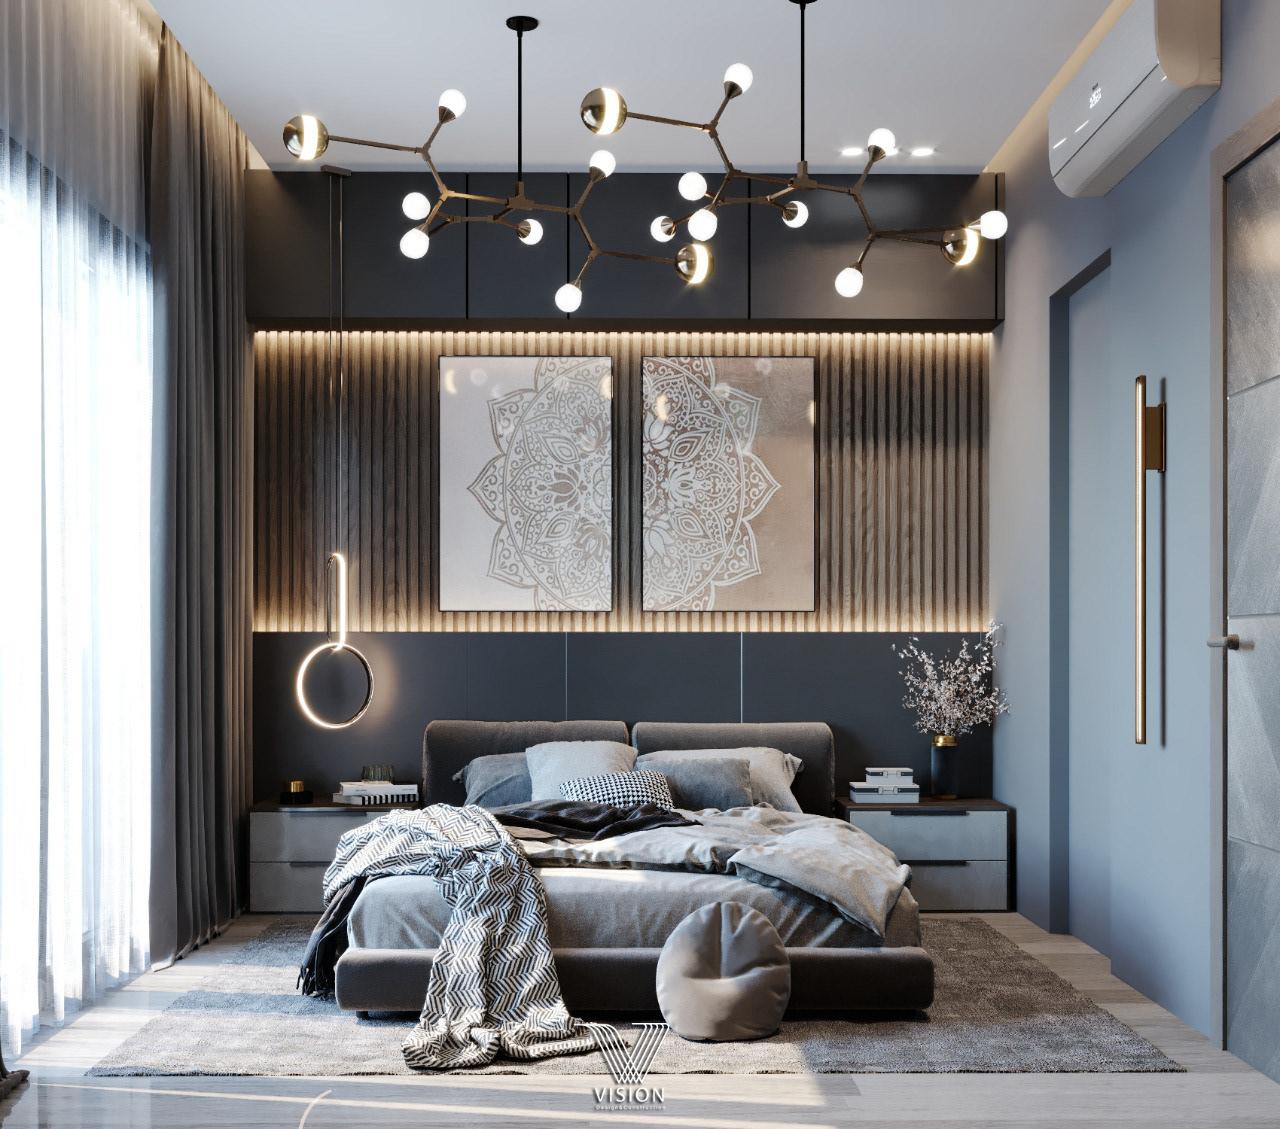 Modern Art Decor For Luxurious Master Bedroom Ideas